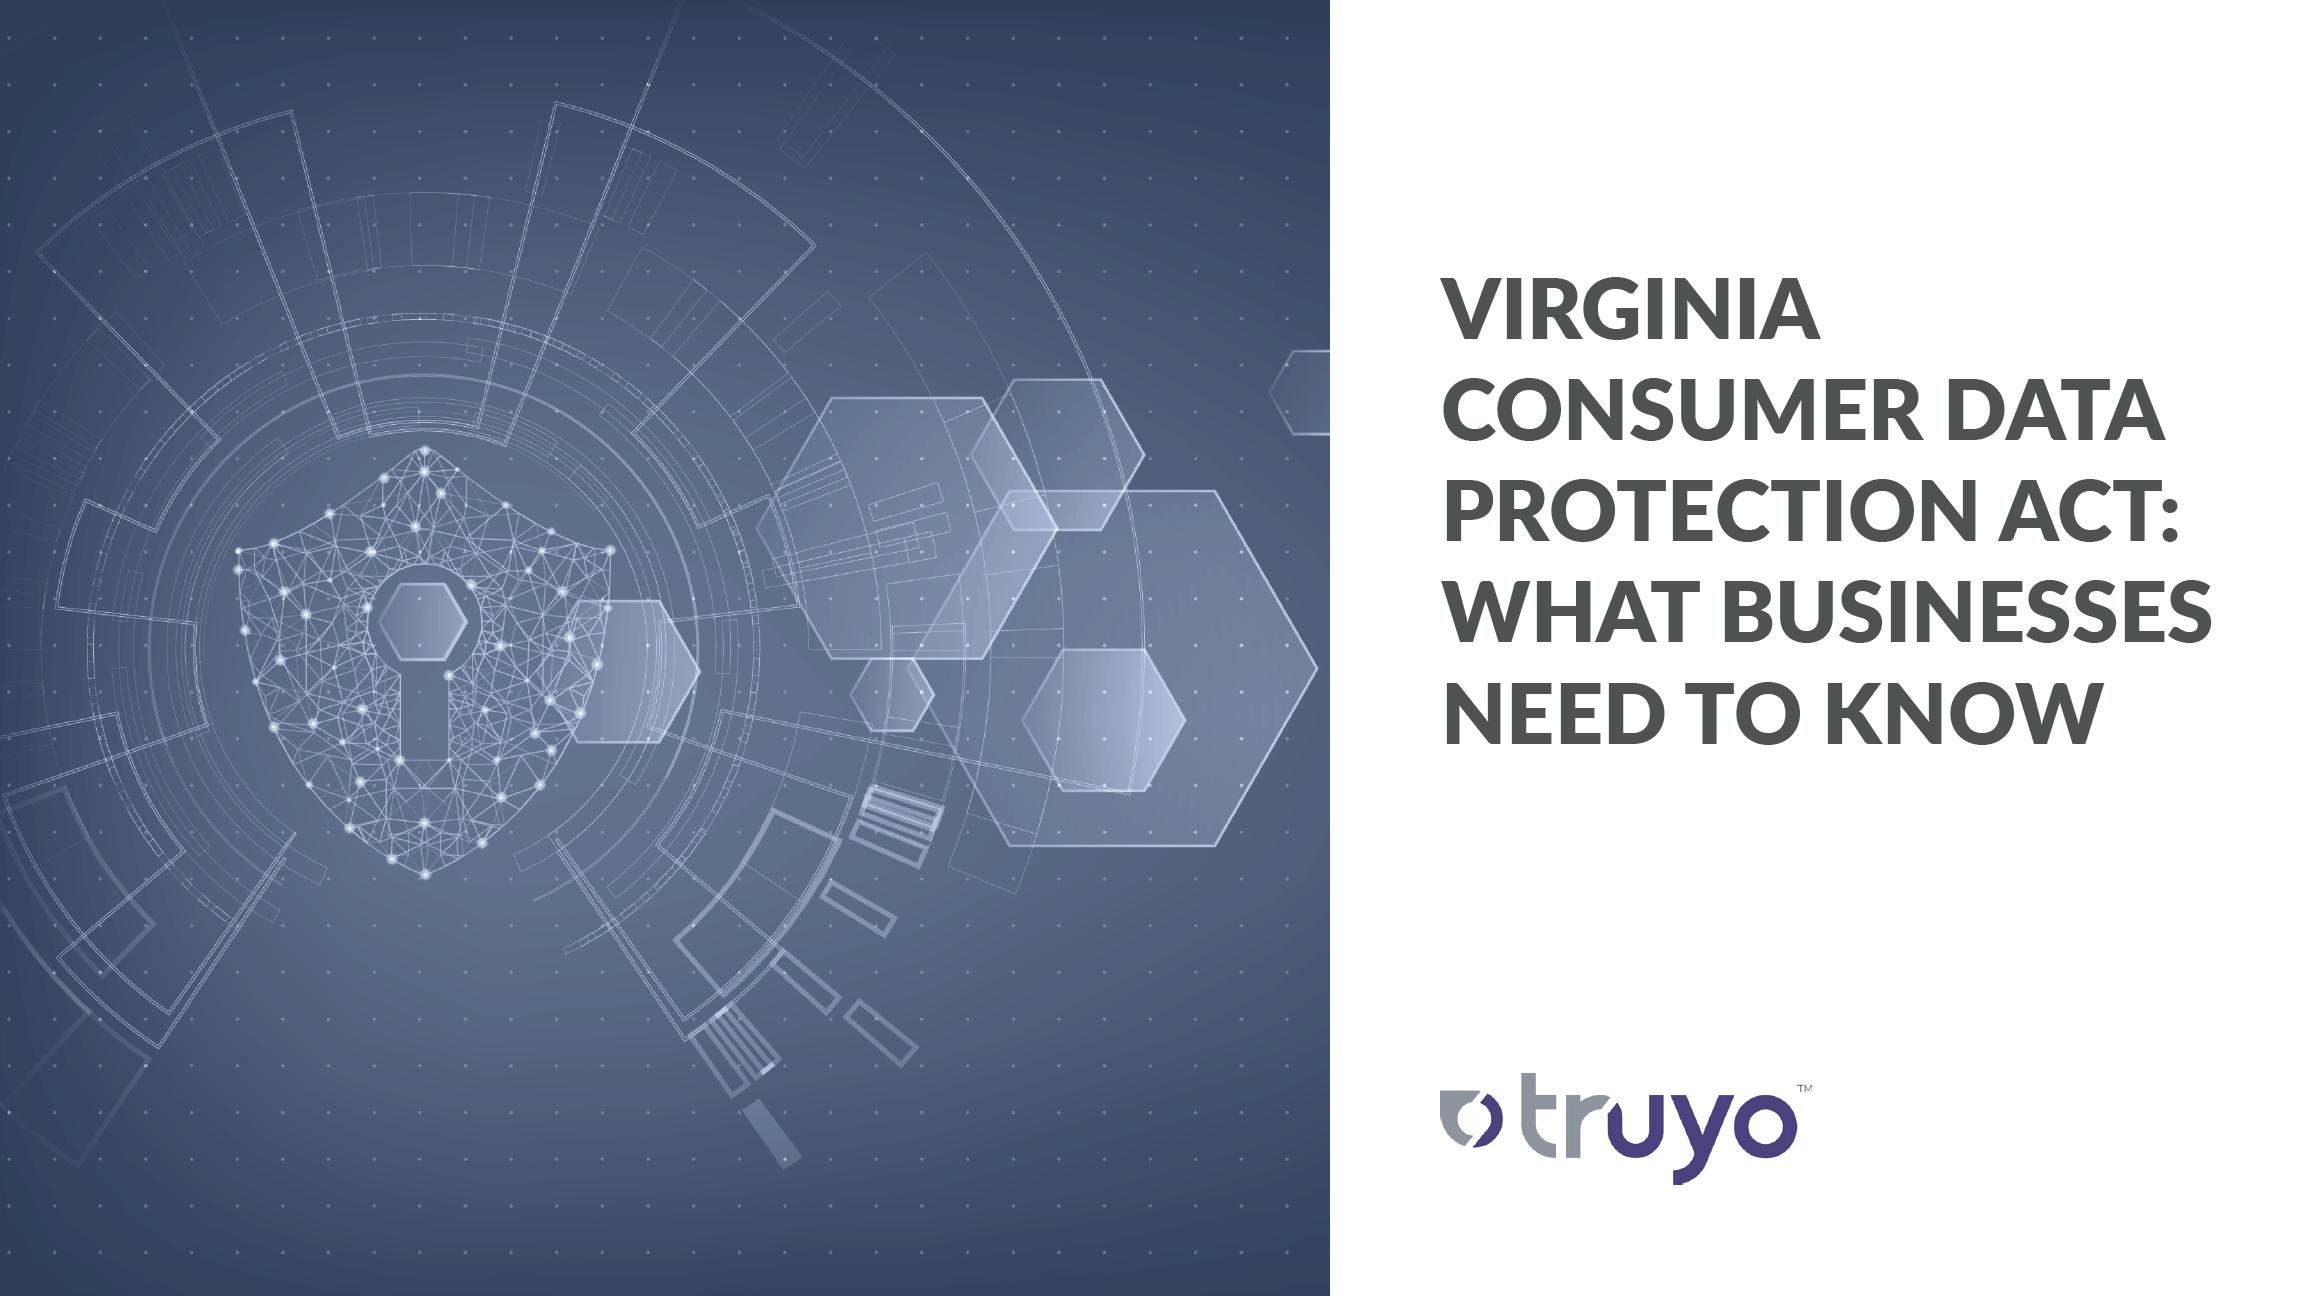 Virginia Consumer Data Protection Act - VCDPA